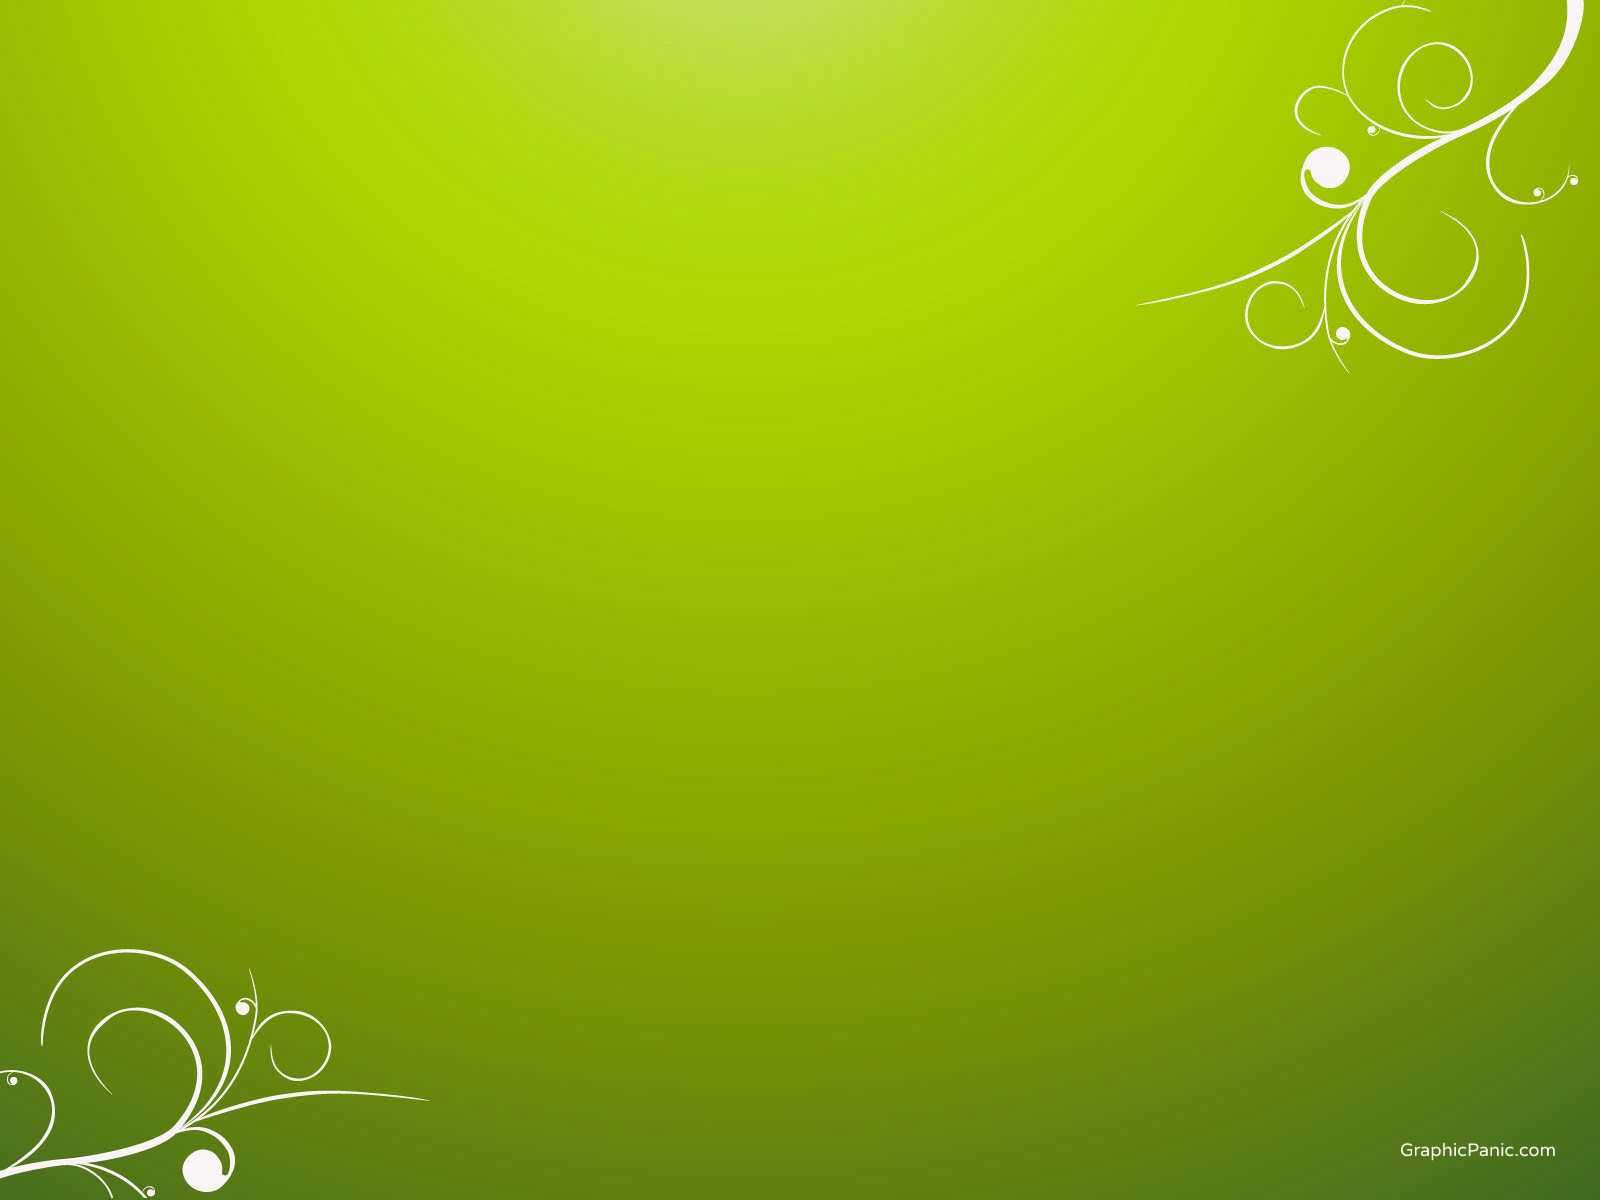 Flower Powerpoint Template | Powerpoint Background And In Microsoft Office Powerpoint Background Templates